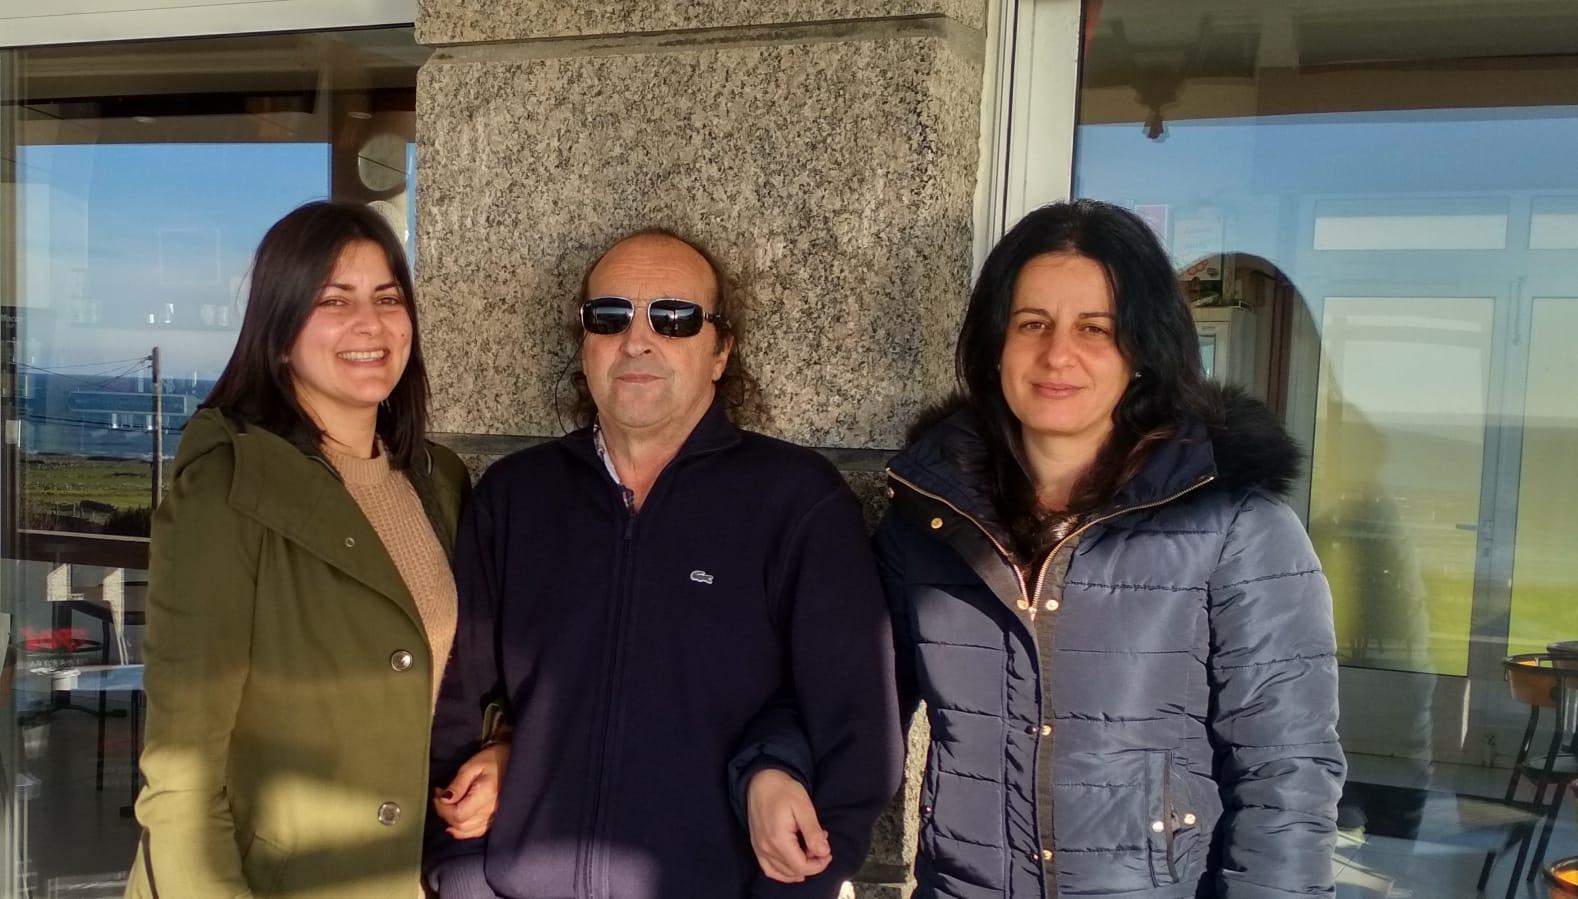 As tres persoas veciñas de Oia autoras do libro: LucíaÁlvarez Caeiro, Fernando Javier Costas Goberna e Lorena González Vicente.